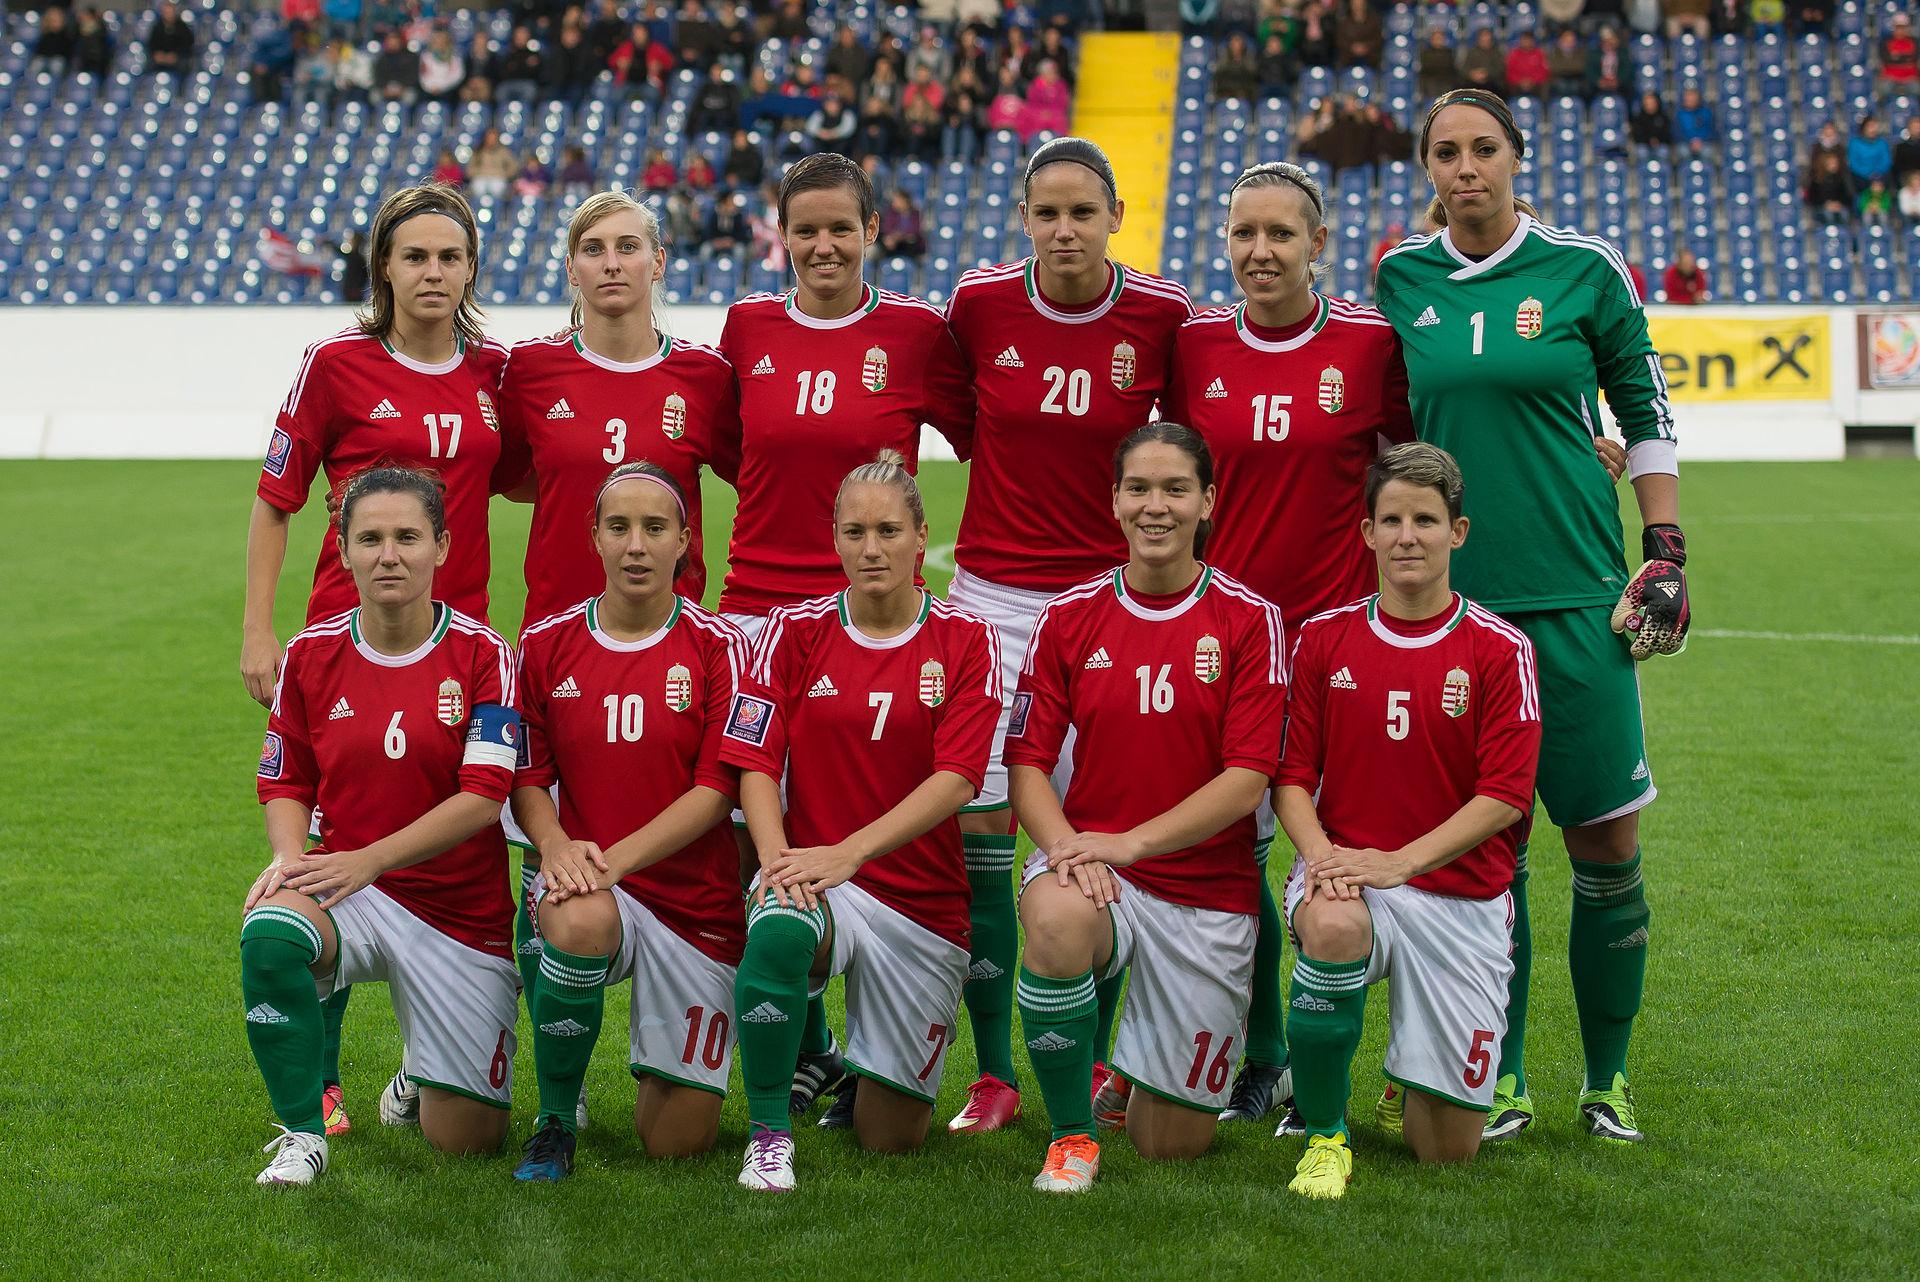 Hungary women's national football team